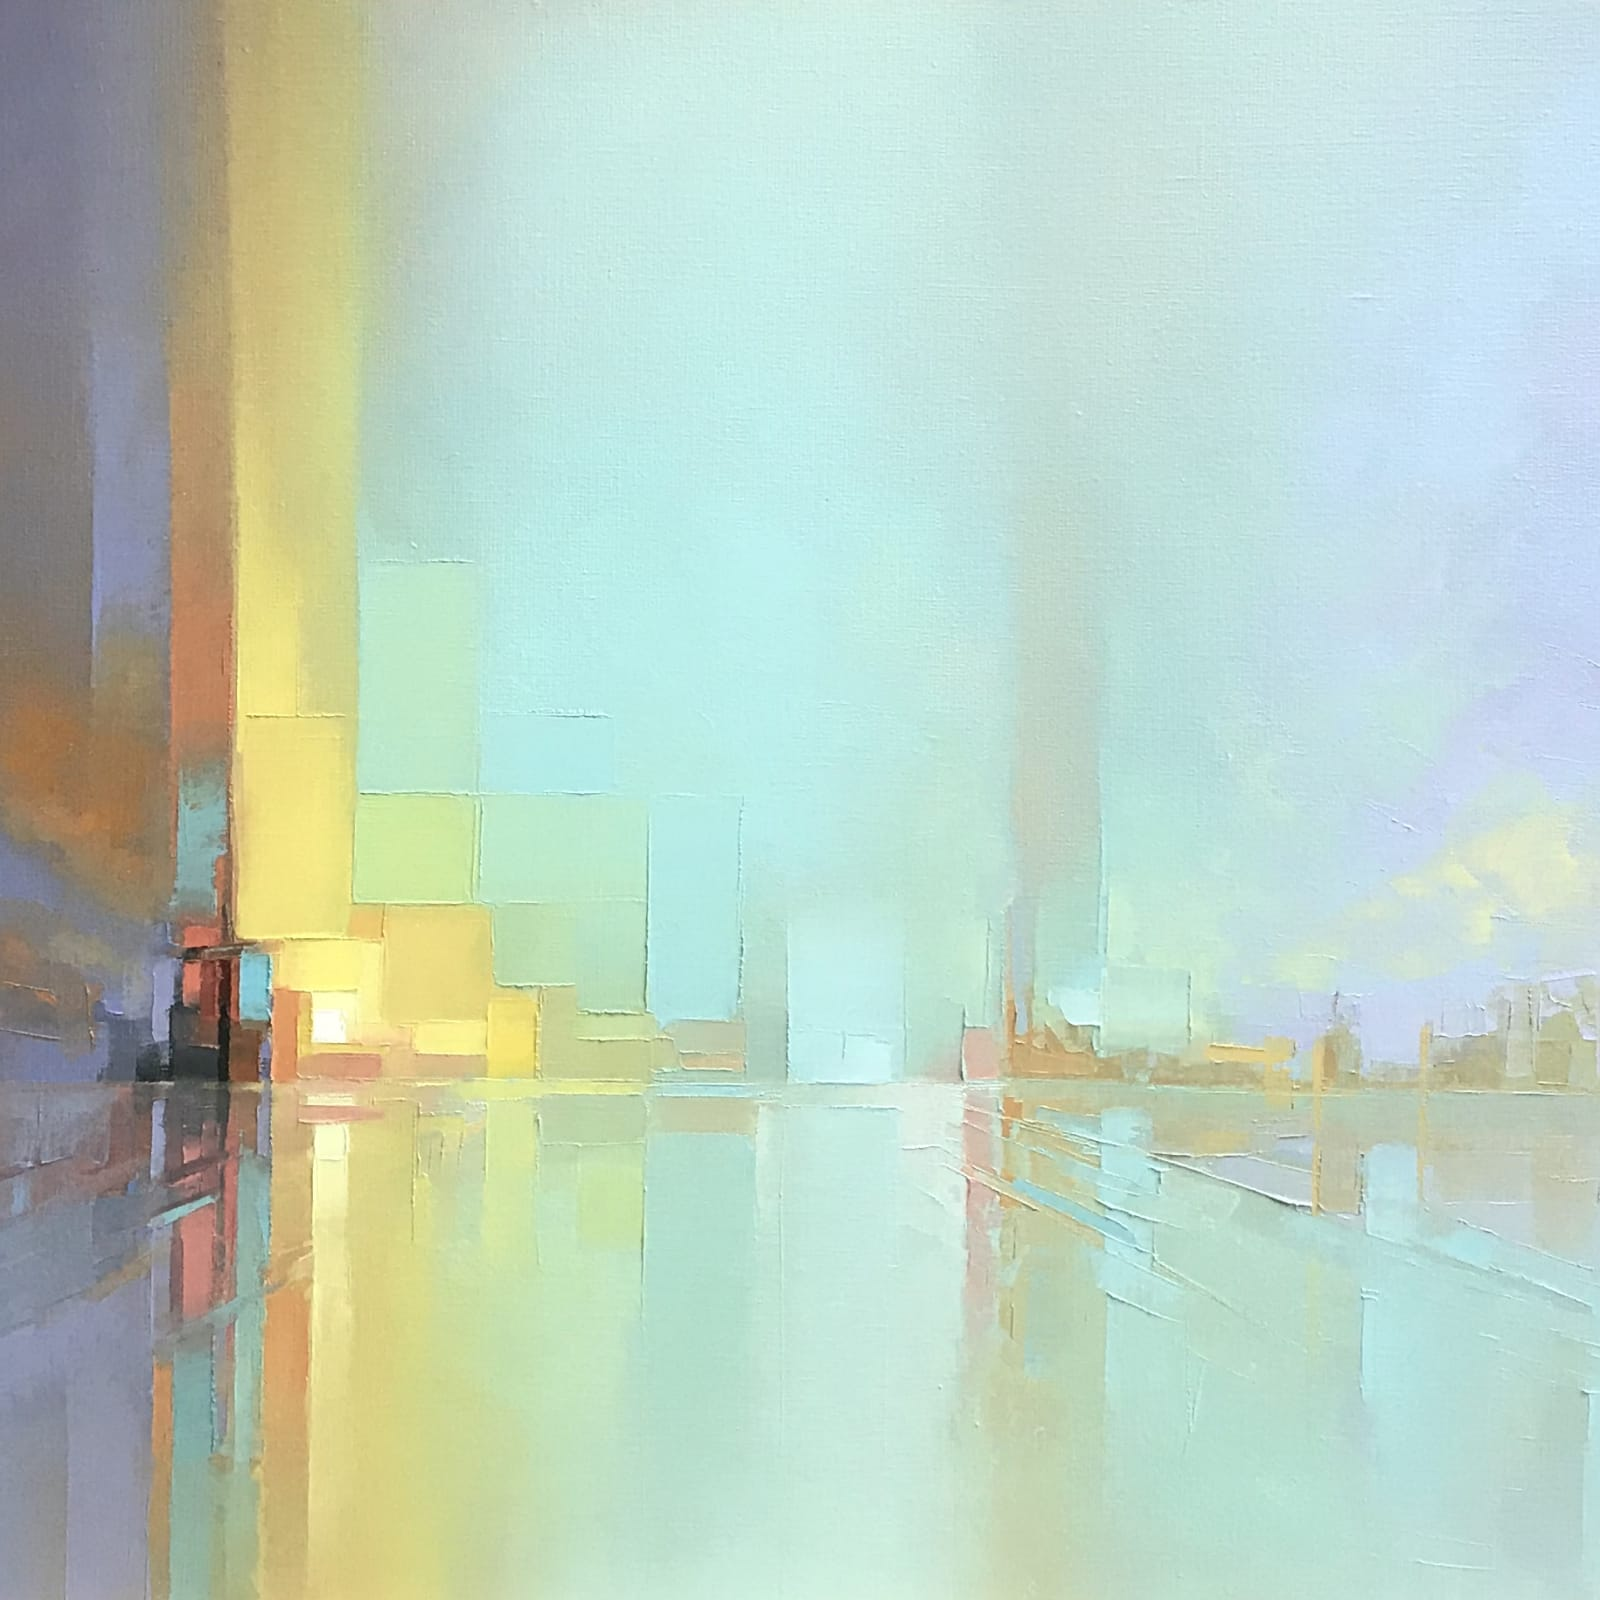 Jason Anderson, Haze